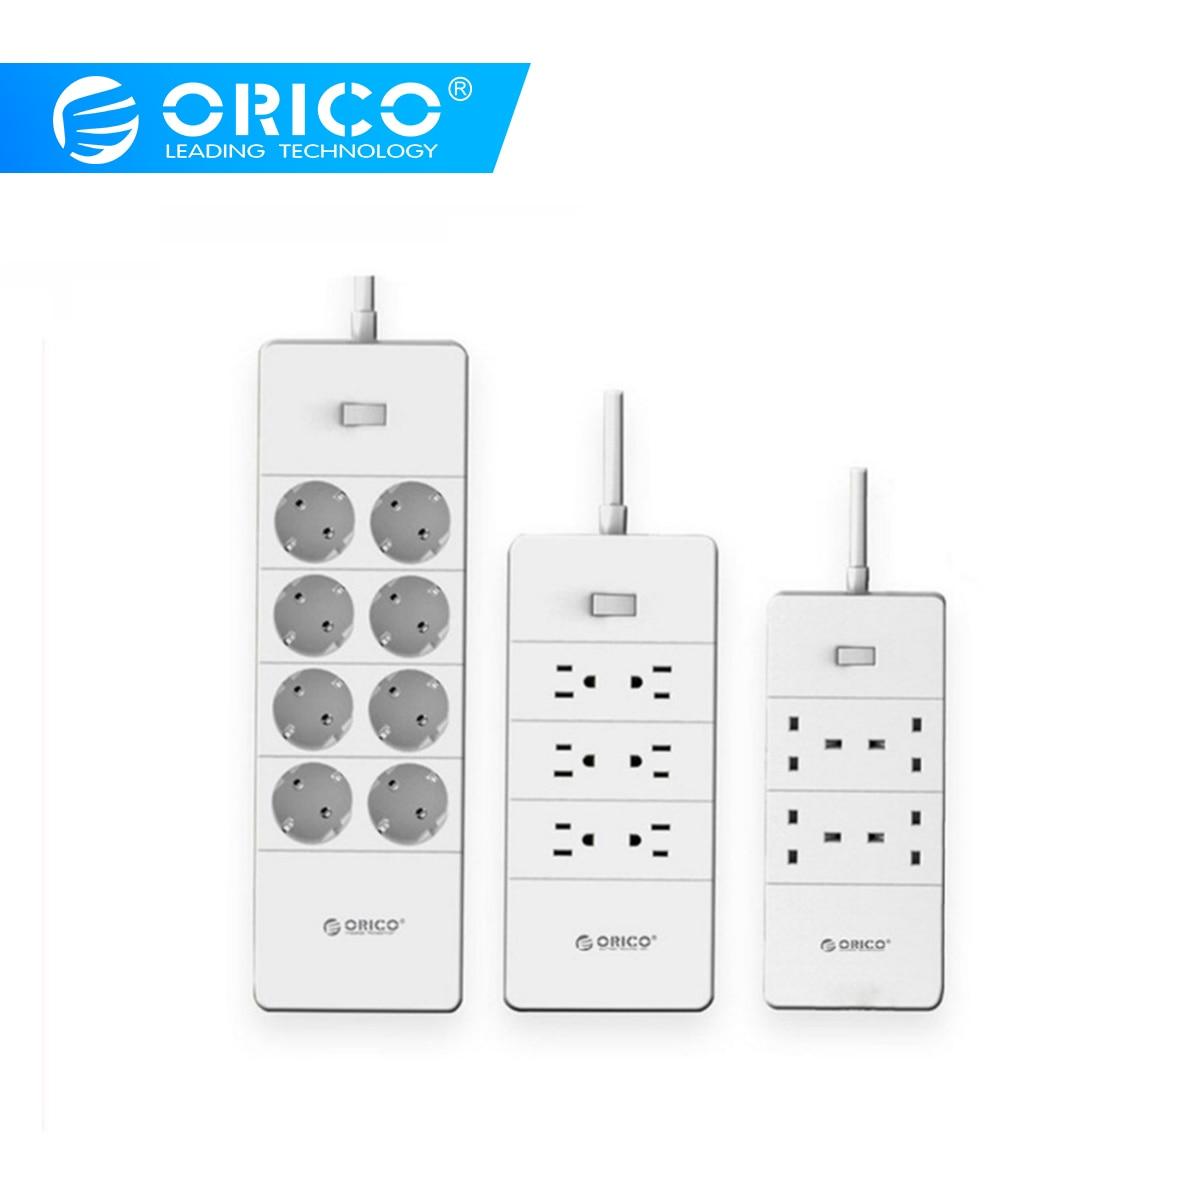 ORICO Power Strip Surge Protector 5 USB Ports EU UK US Extension Socket 4 6 8